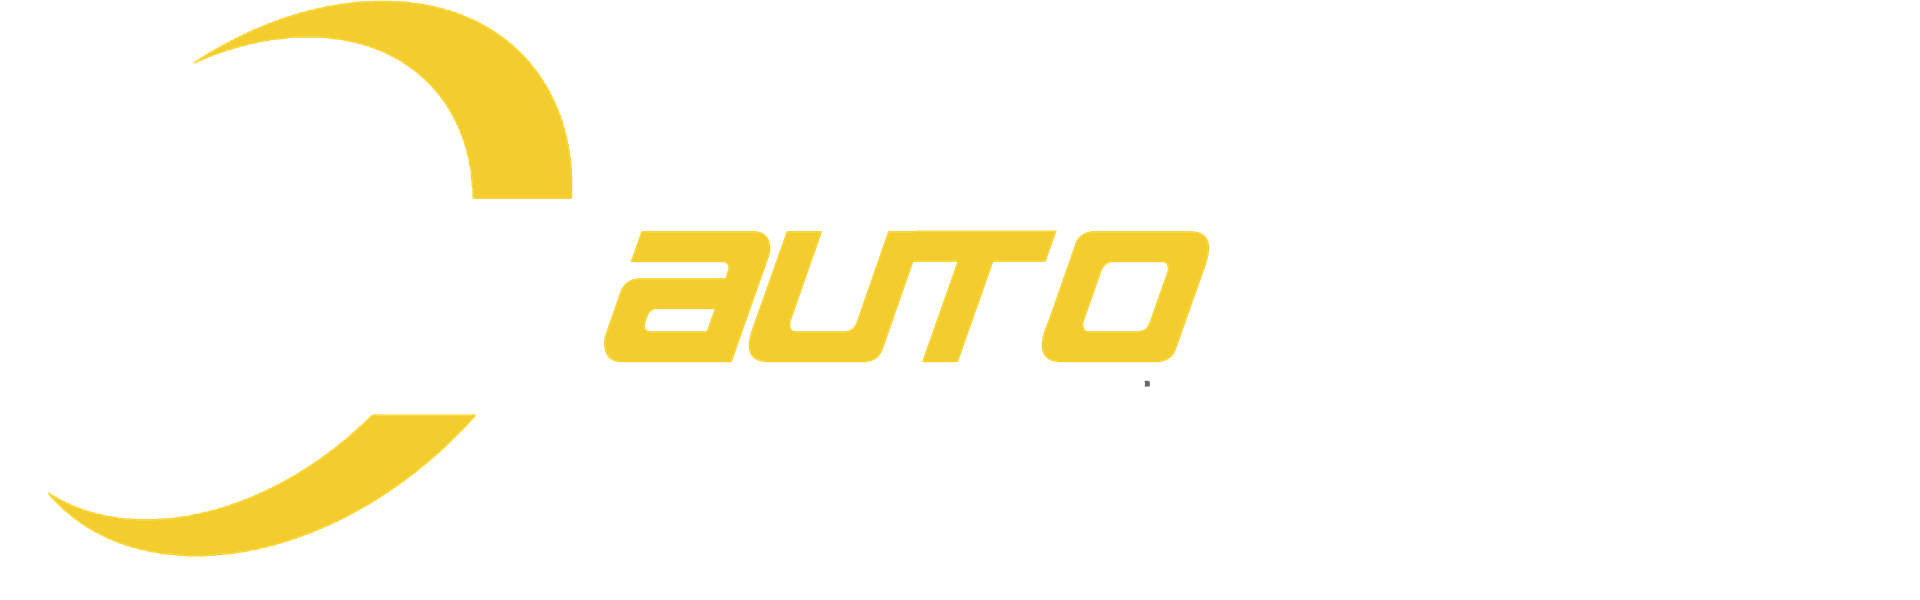 Z's Auto Wheel and Tyres